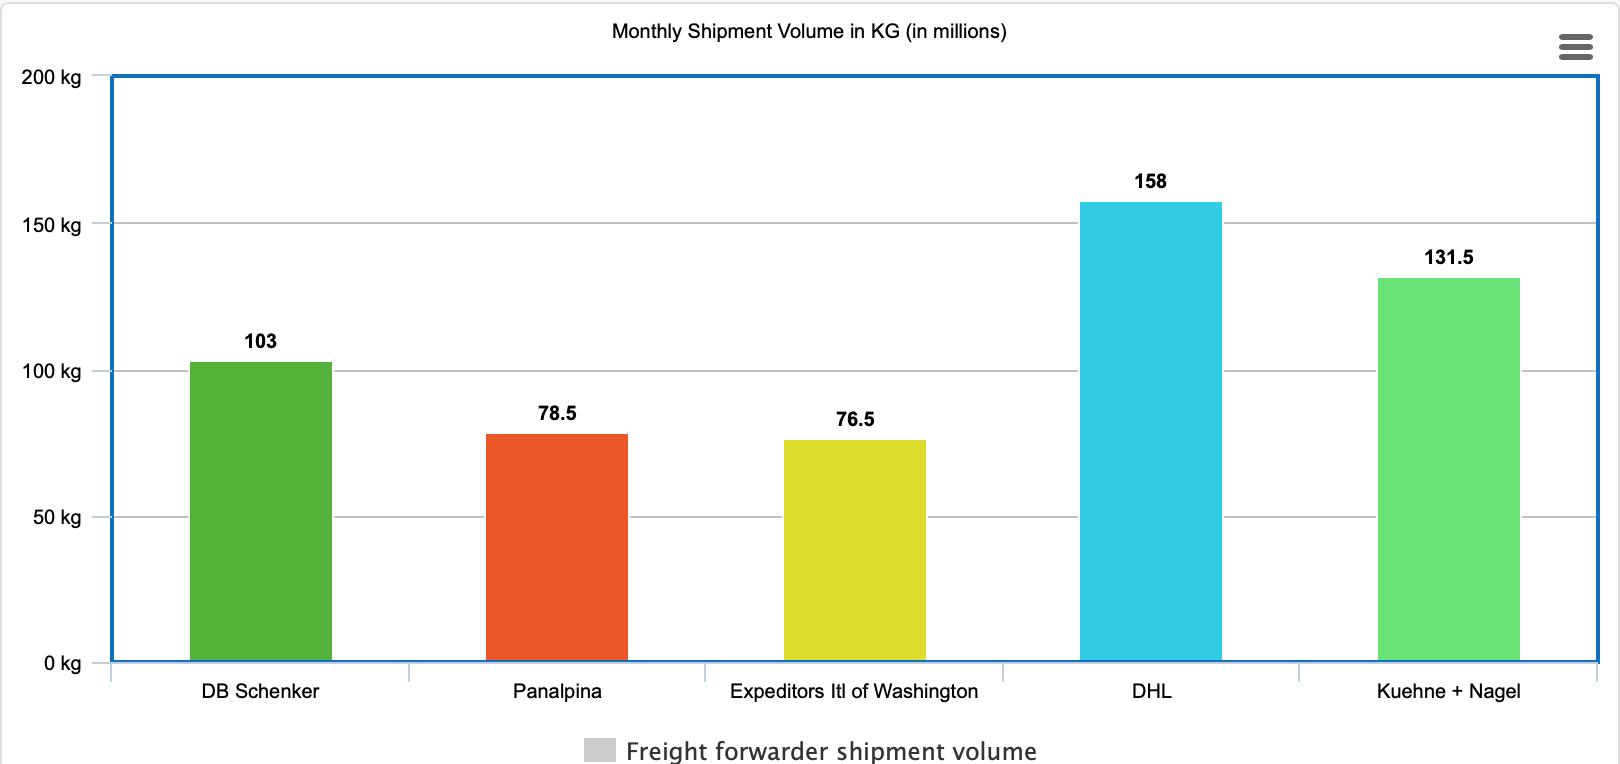 monthly shipment volume